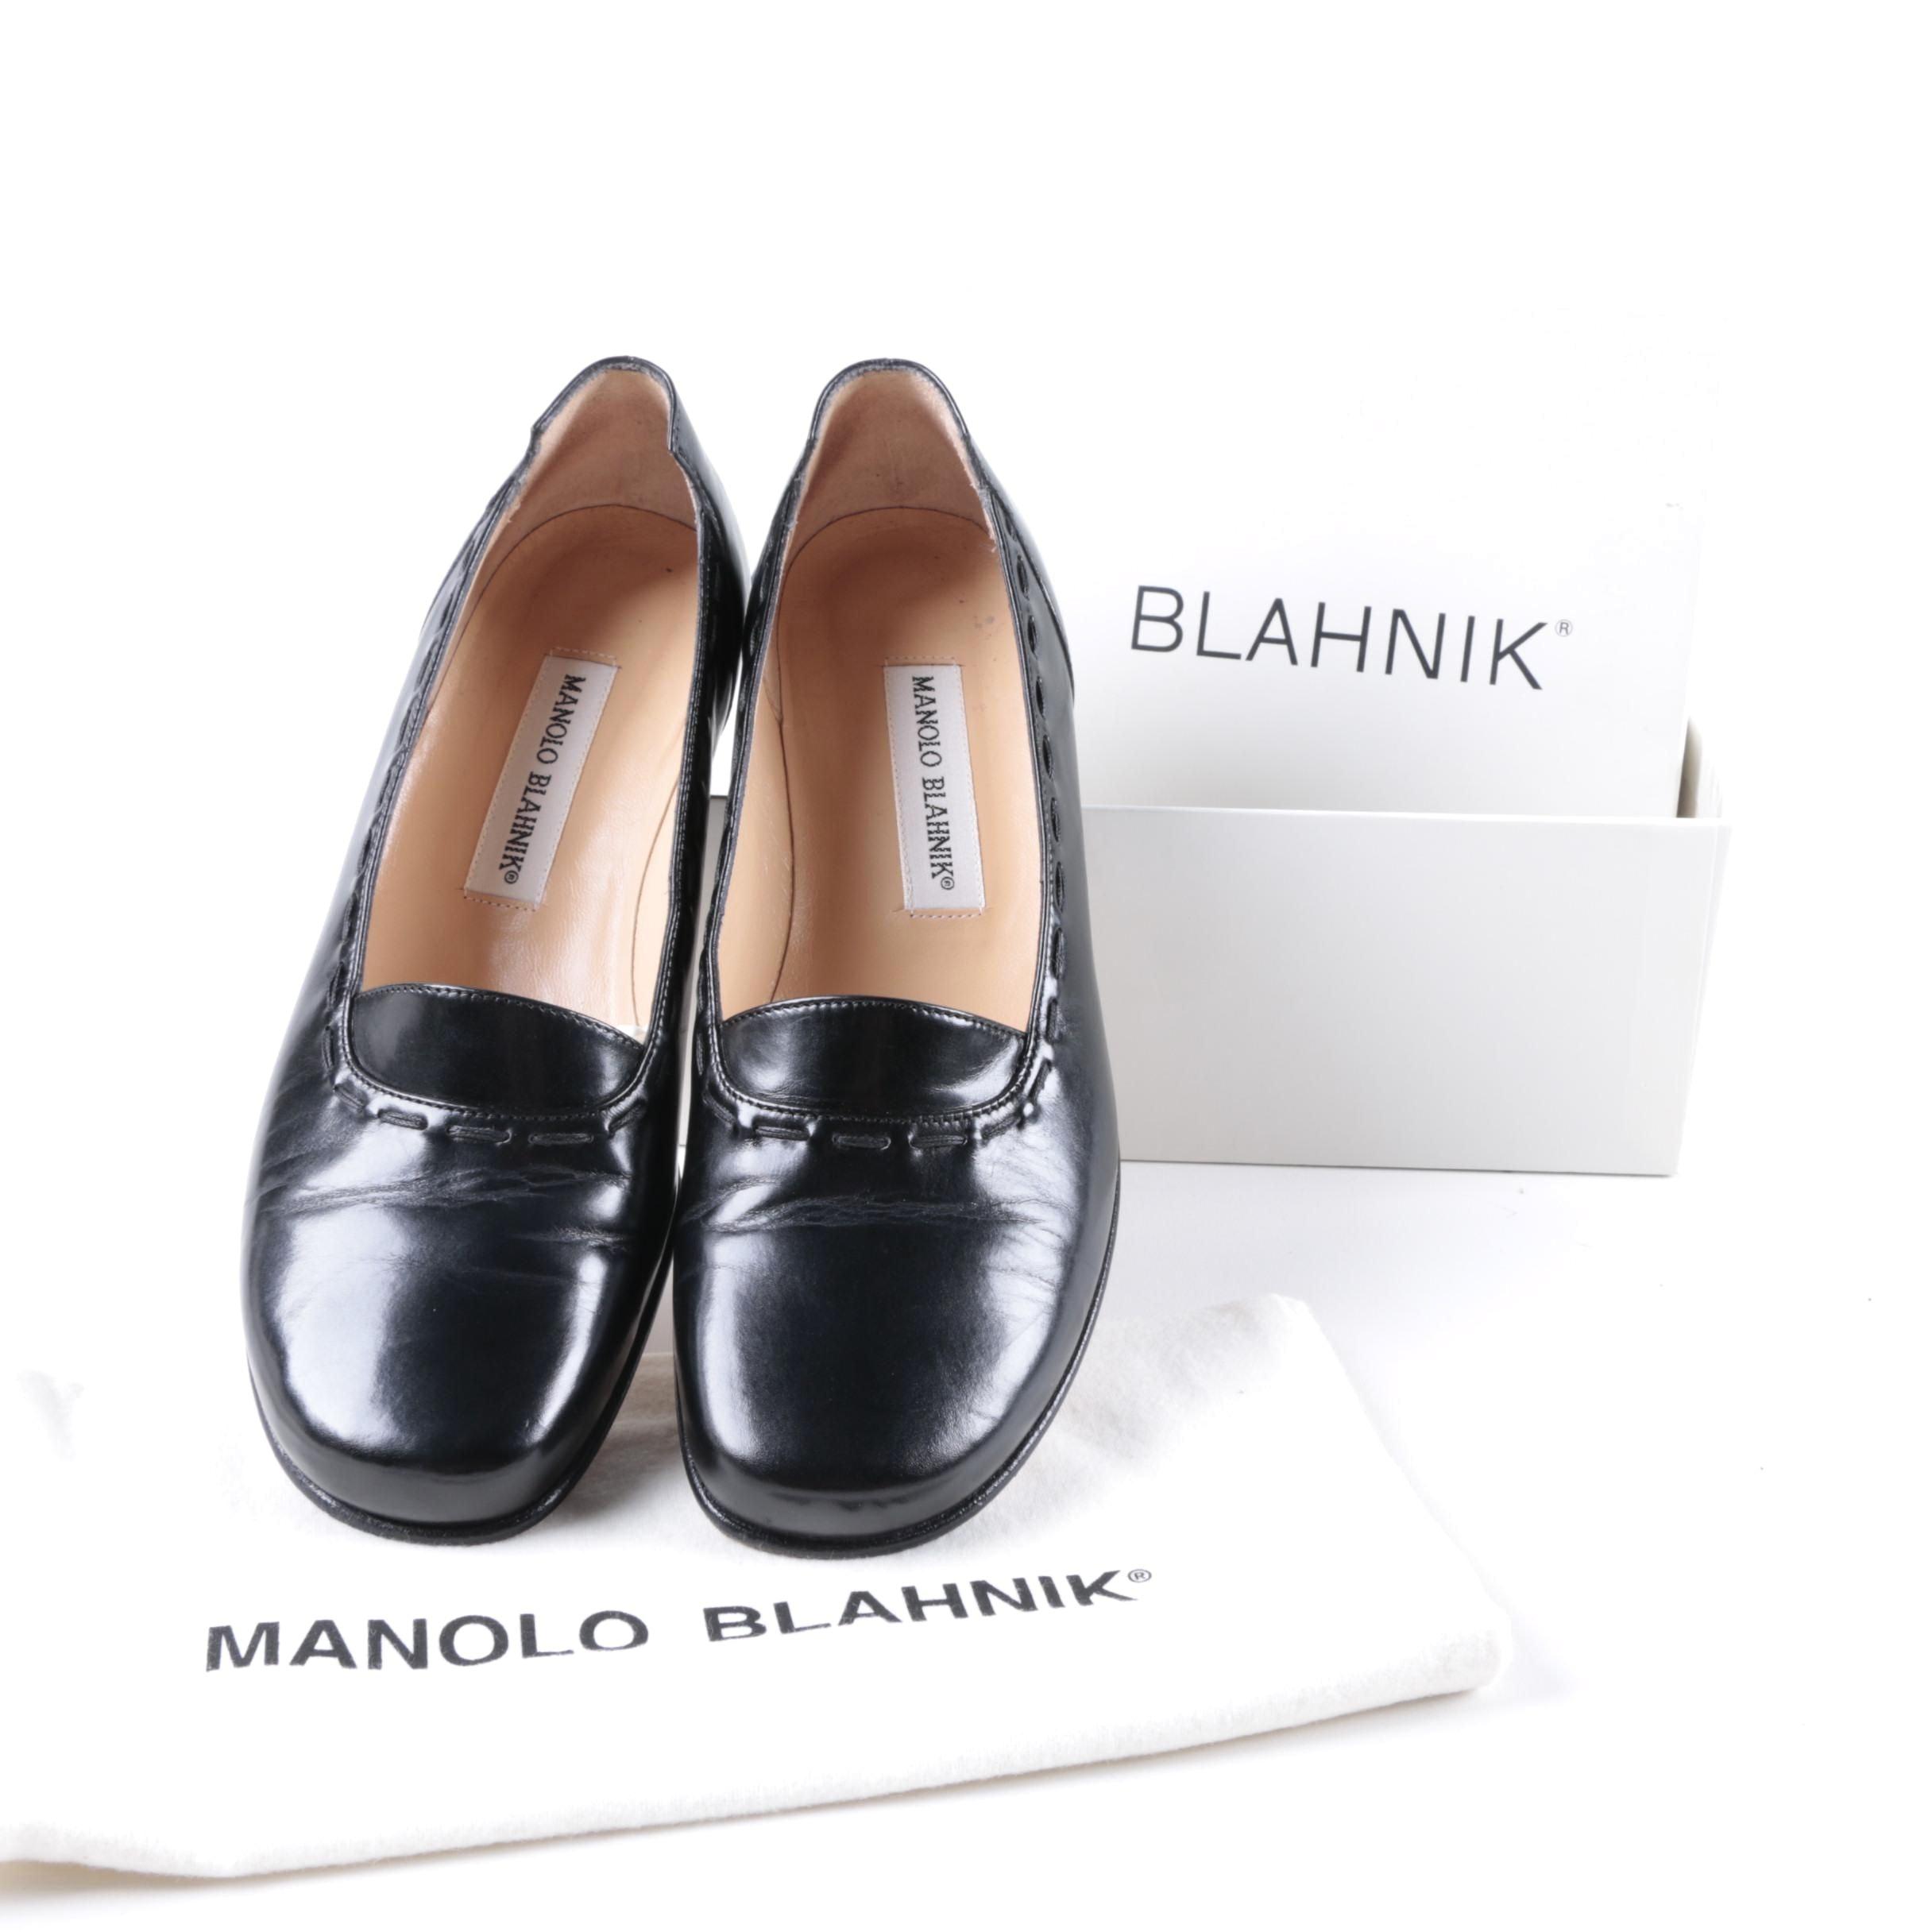 Manolo Blahnik Black Leather Loafers